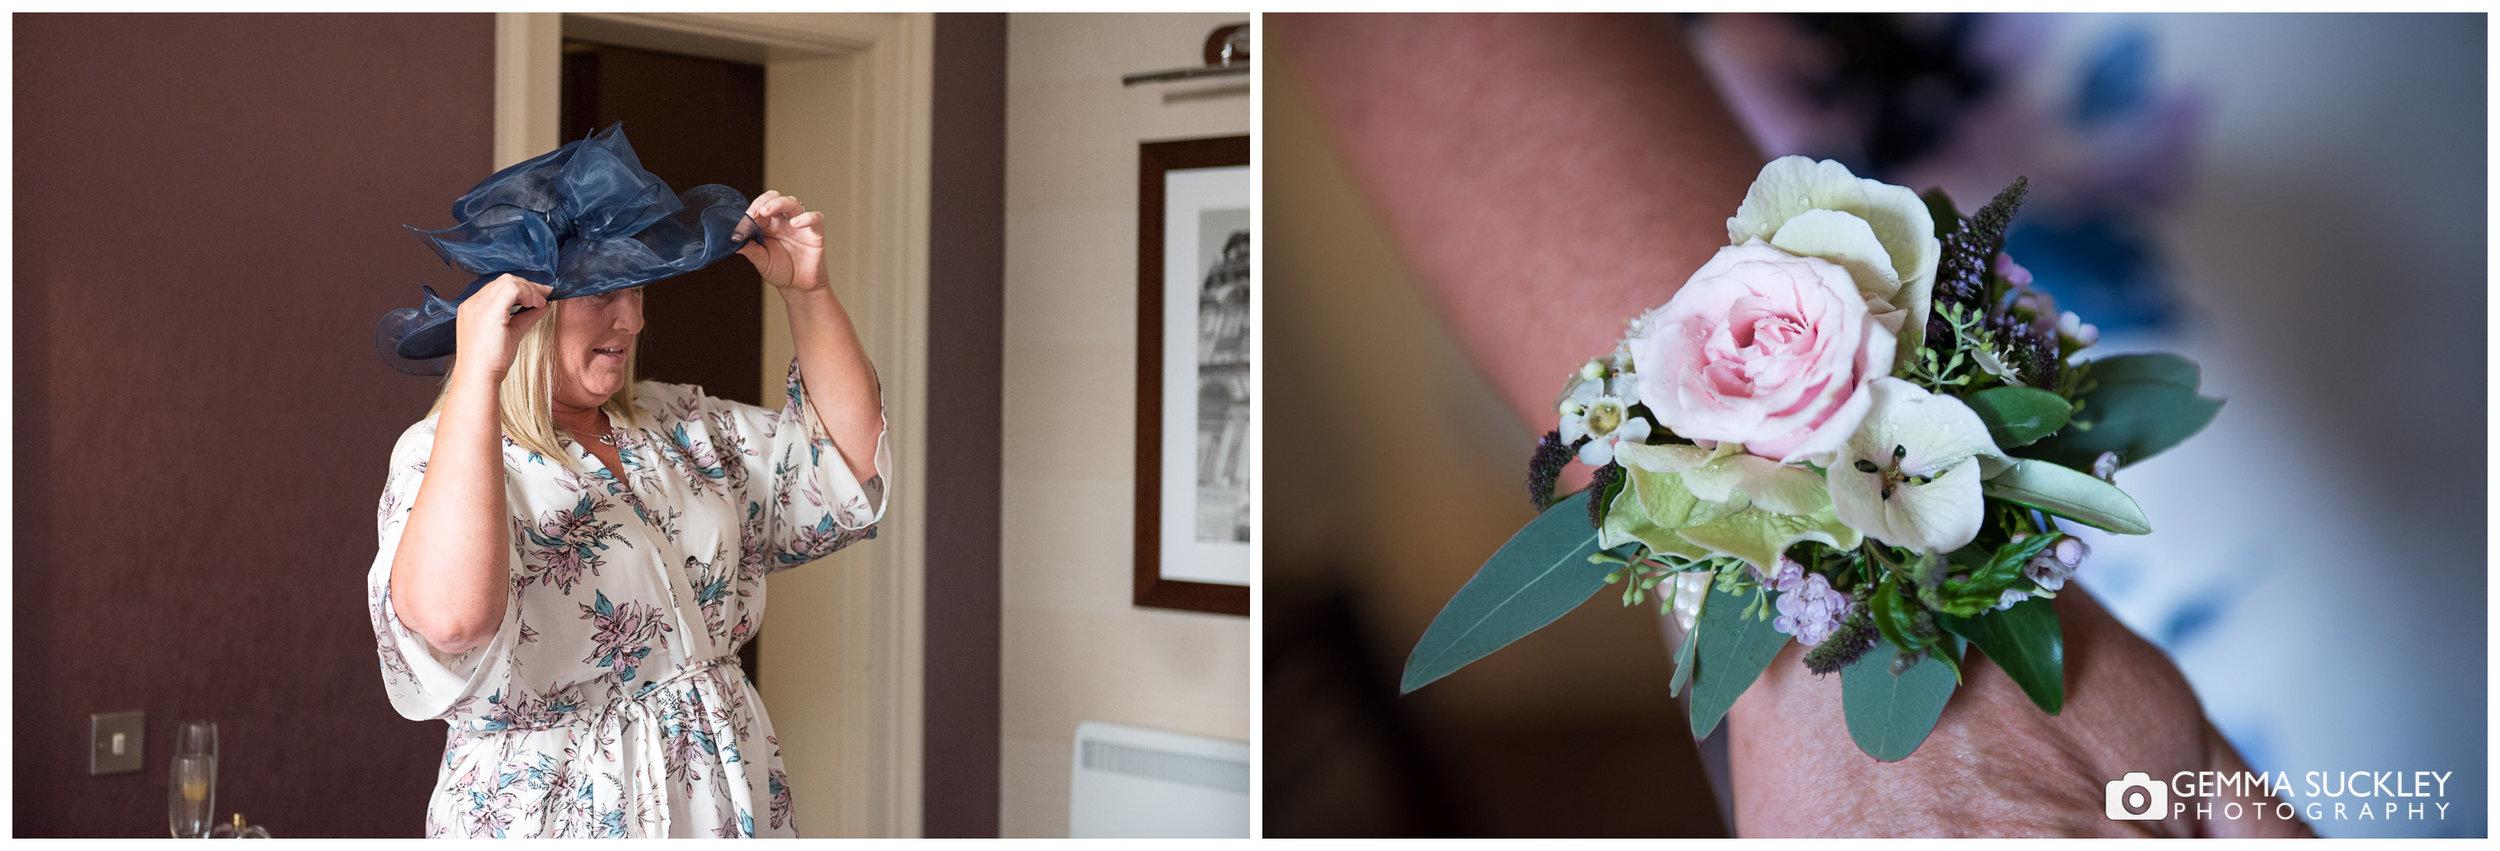 wedding-corsage-harrogate-wedding-©gemmasuckleyphotography.jpg